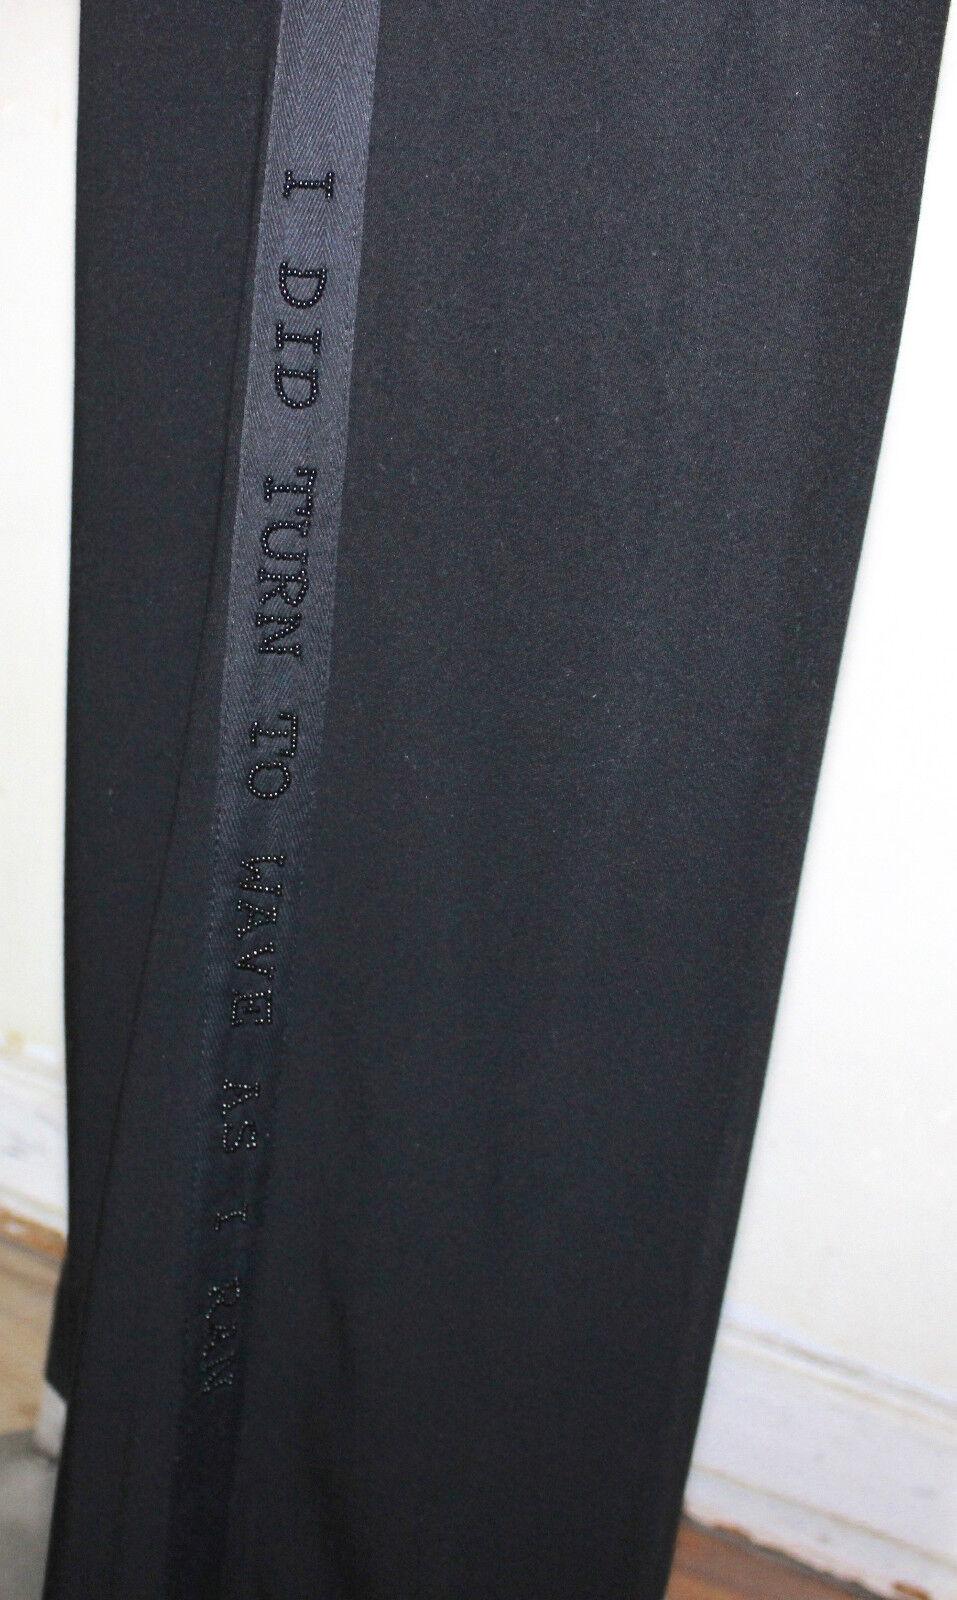 Ann Demeulemeester Spring 2000 WOOLGATHERING Patti Smith beaded pants 38